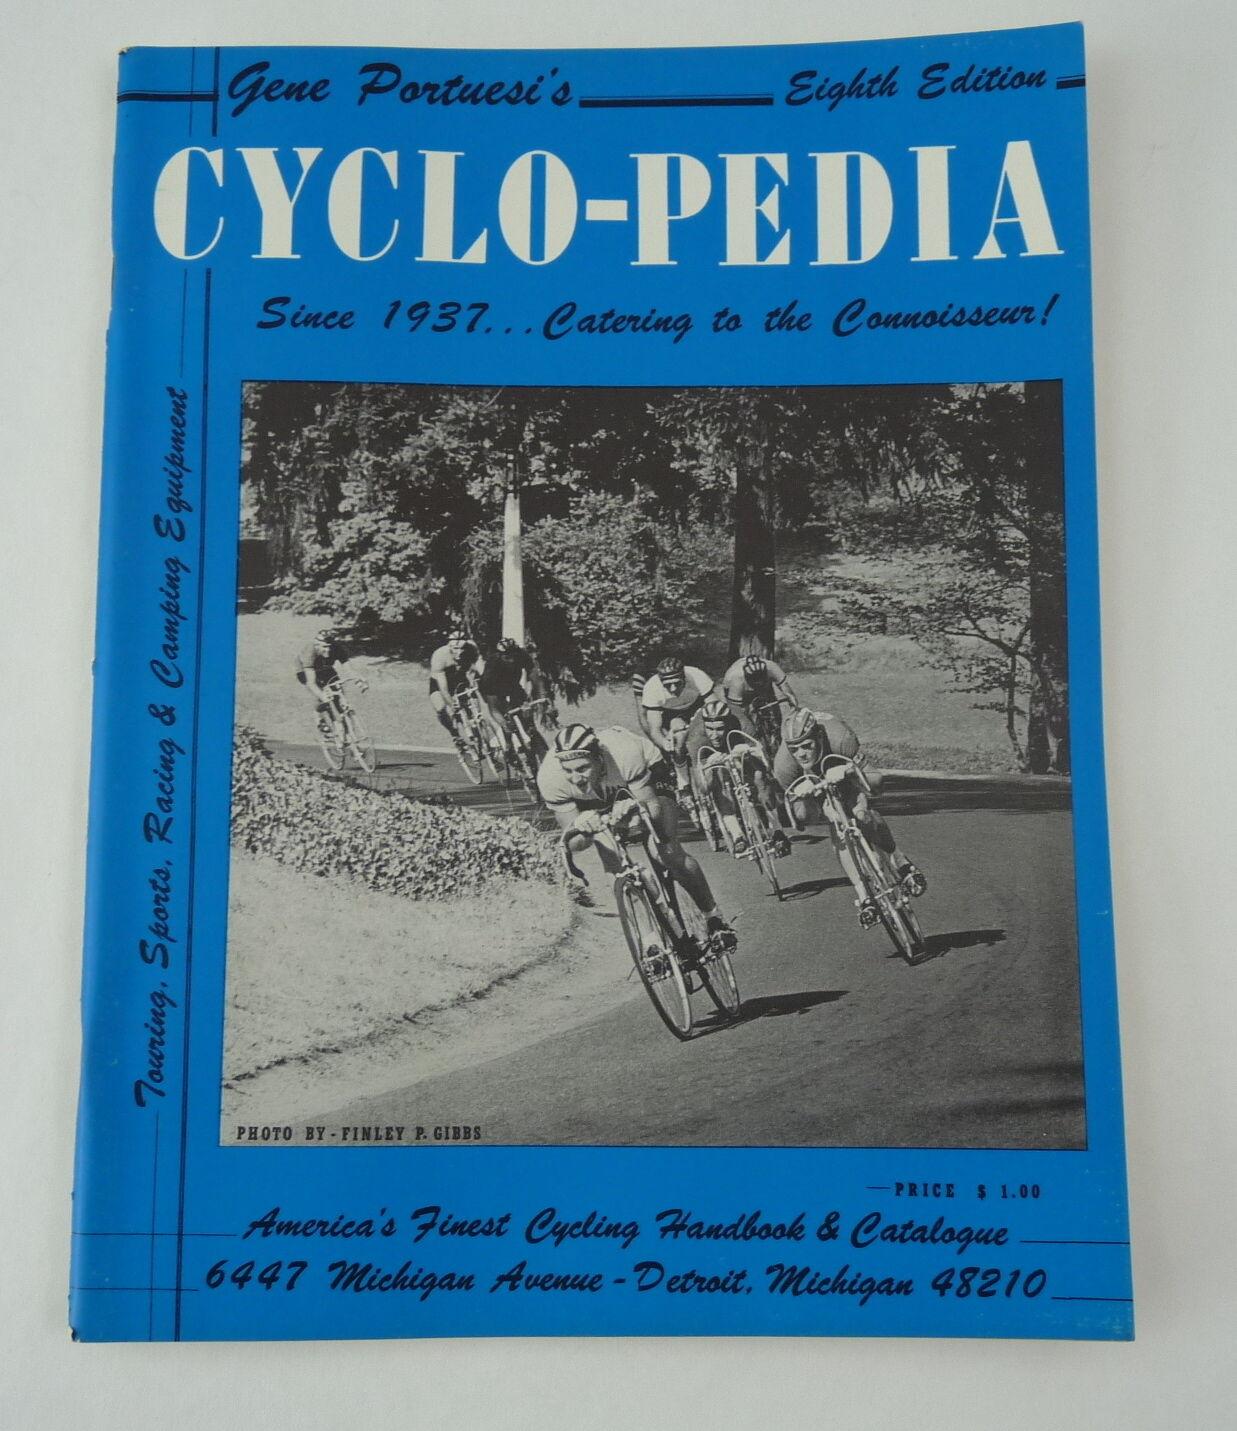 Cyclo-Pedia eighth ed. catalog  1968 Gene Portuesi's Cyclopedia Cyclo 8th NOS